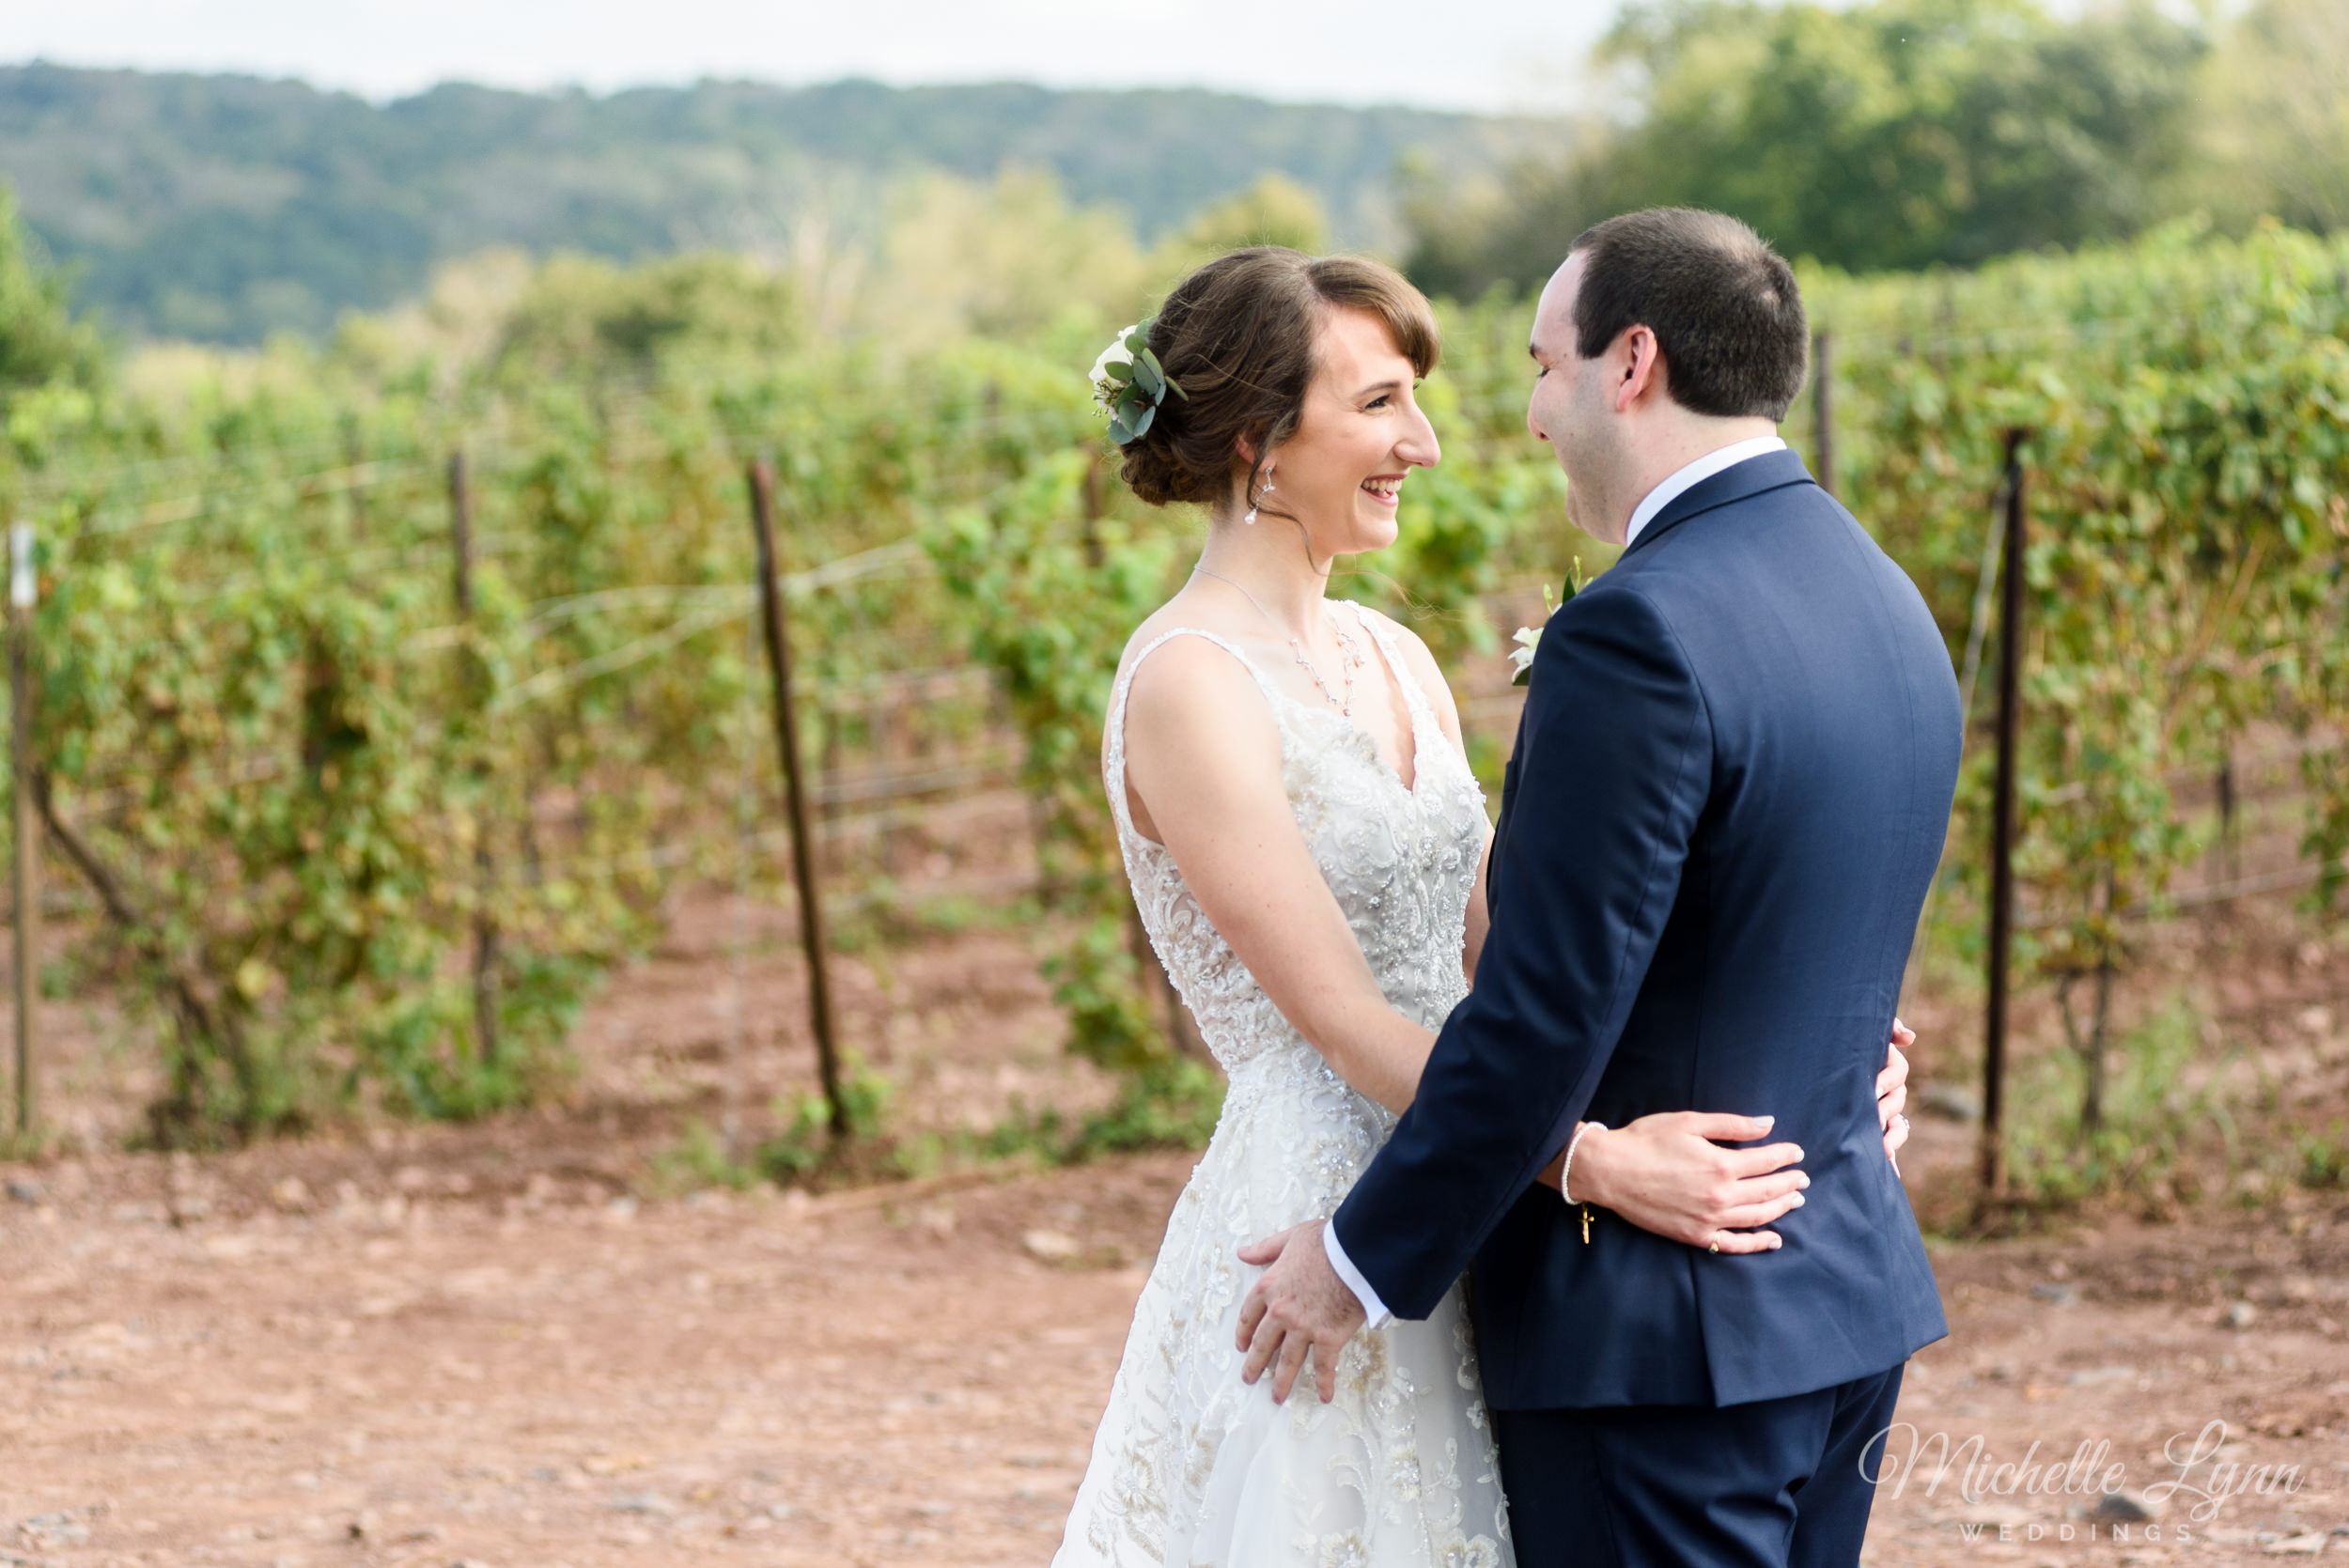 sand-castle-winery-pennsylvania-wedding-photography-34.jpg